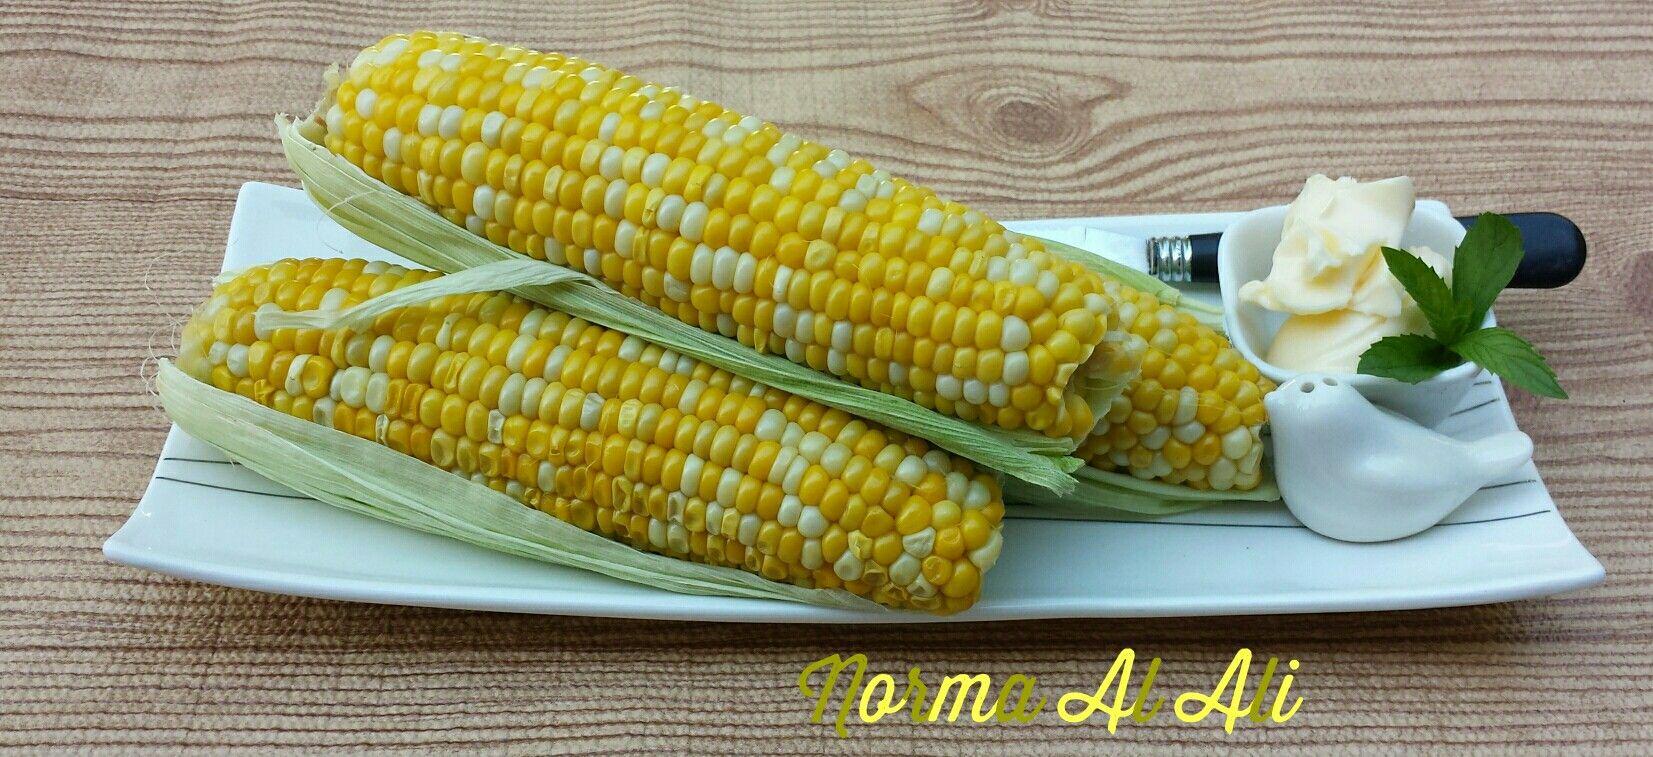 درة مسلوقة Sweet Corn Cooking Food Vegetables